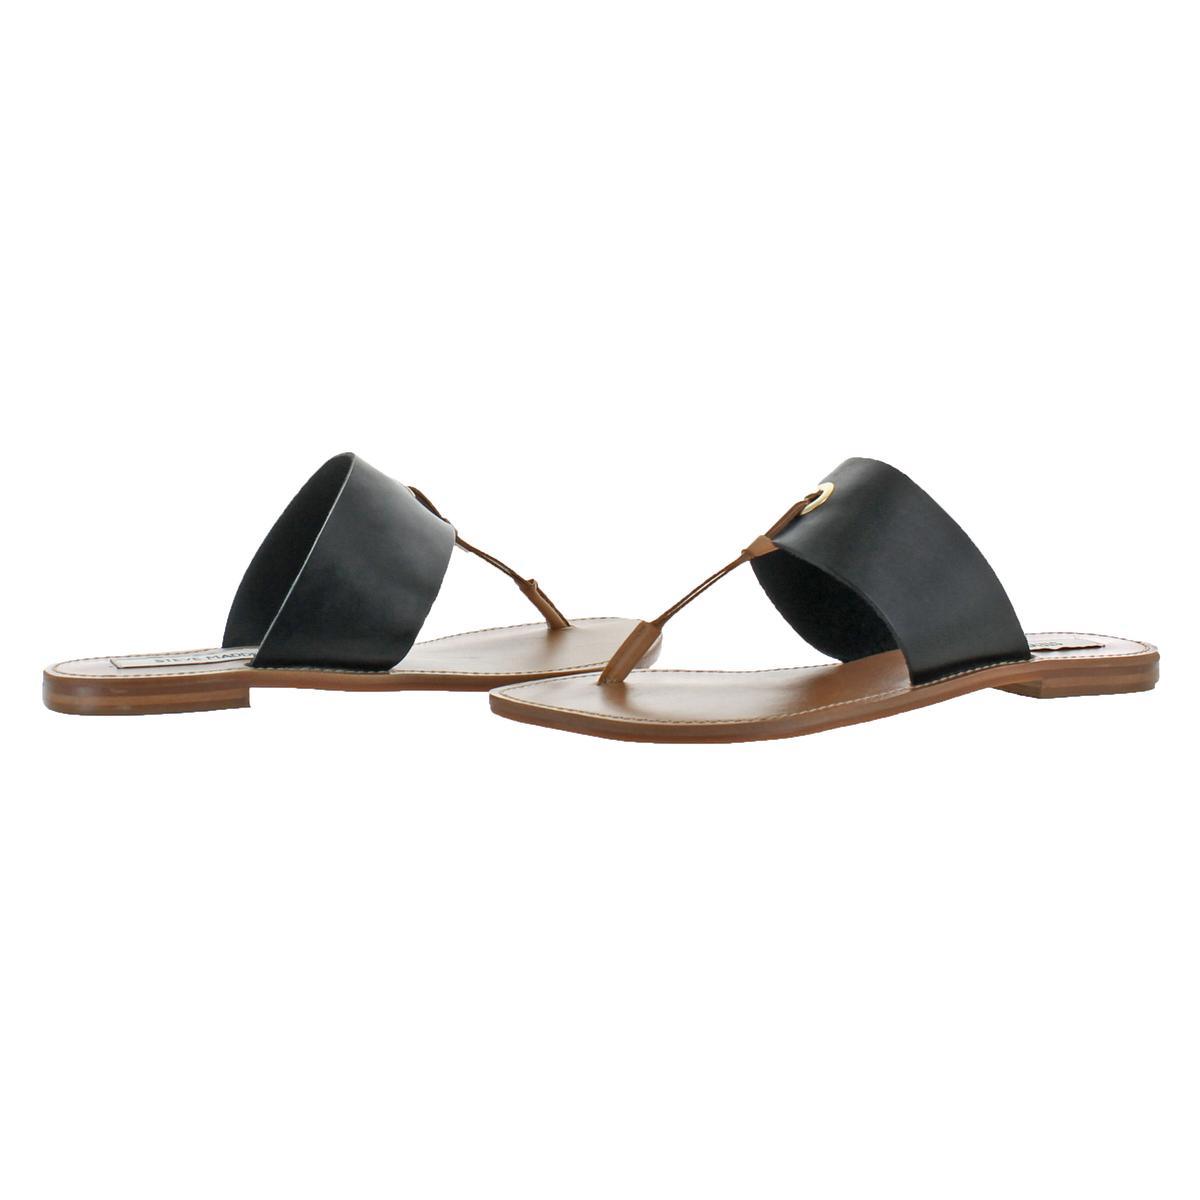 Steve-Madden-Women-039-s-Ringer-Leather-Casual-Thong-Slide-Flat-Sandals-Shoes